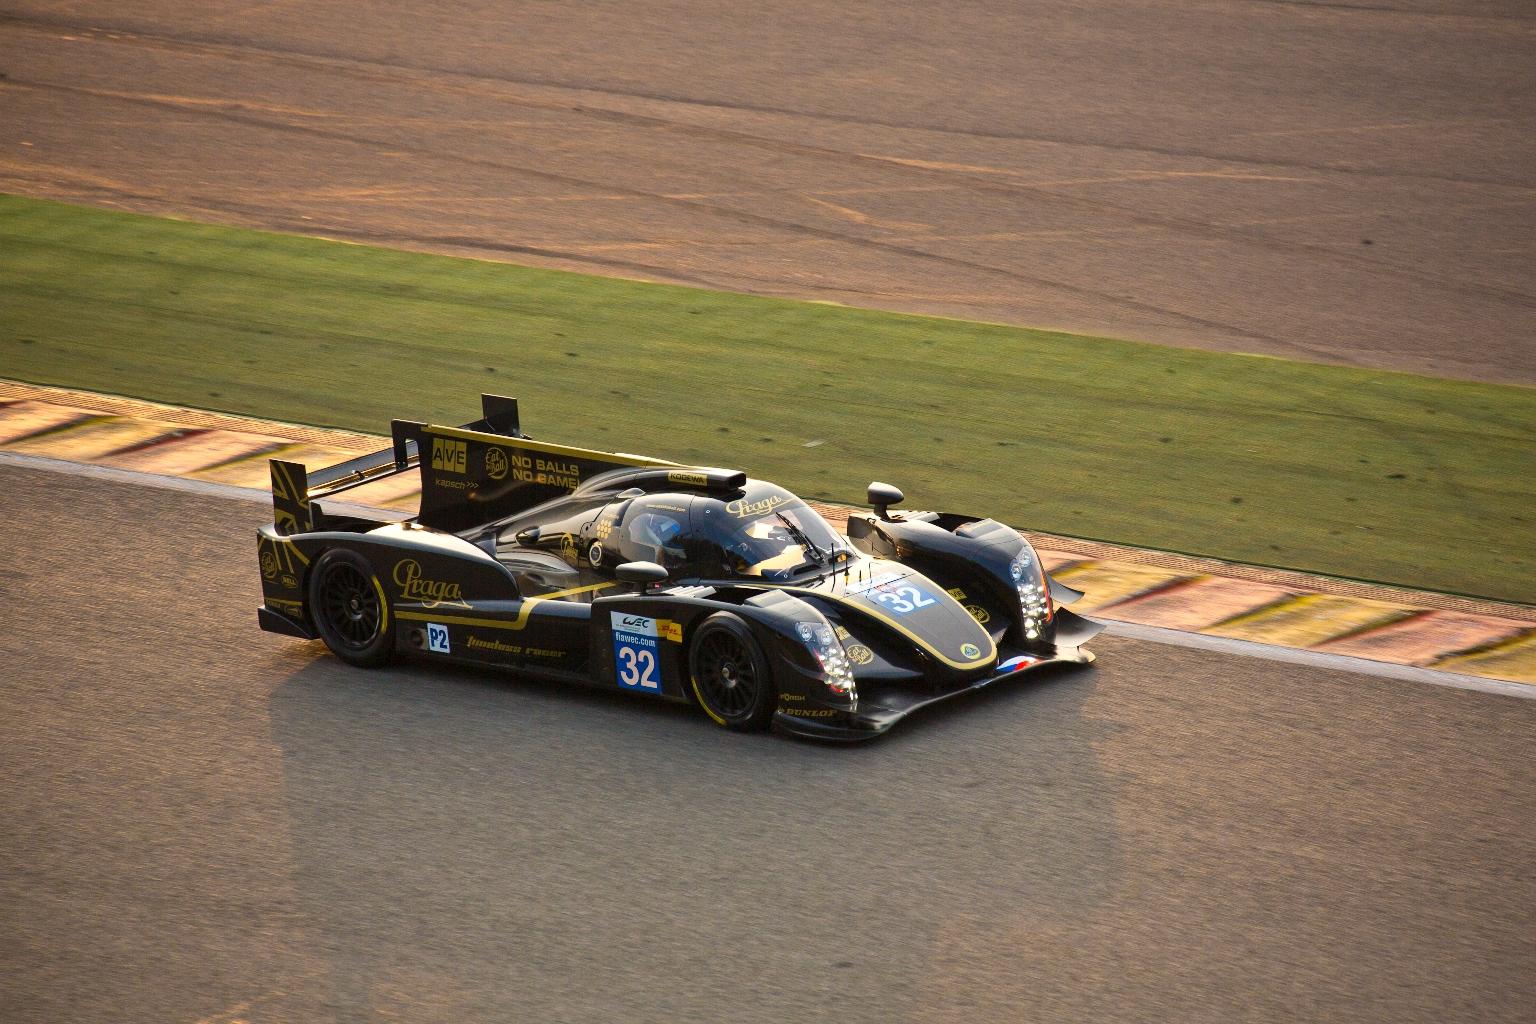 Lotus Praga LMP2 Third Day at the 24 Hours of Le Mans